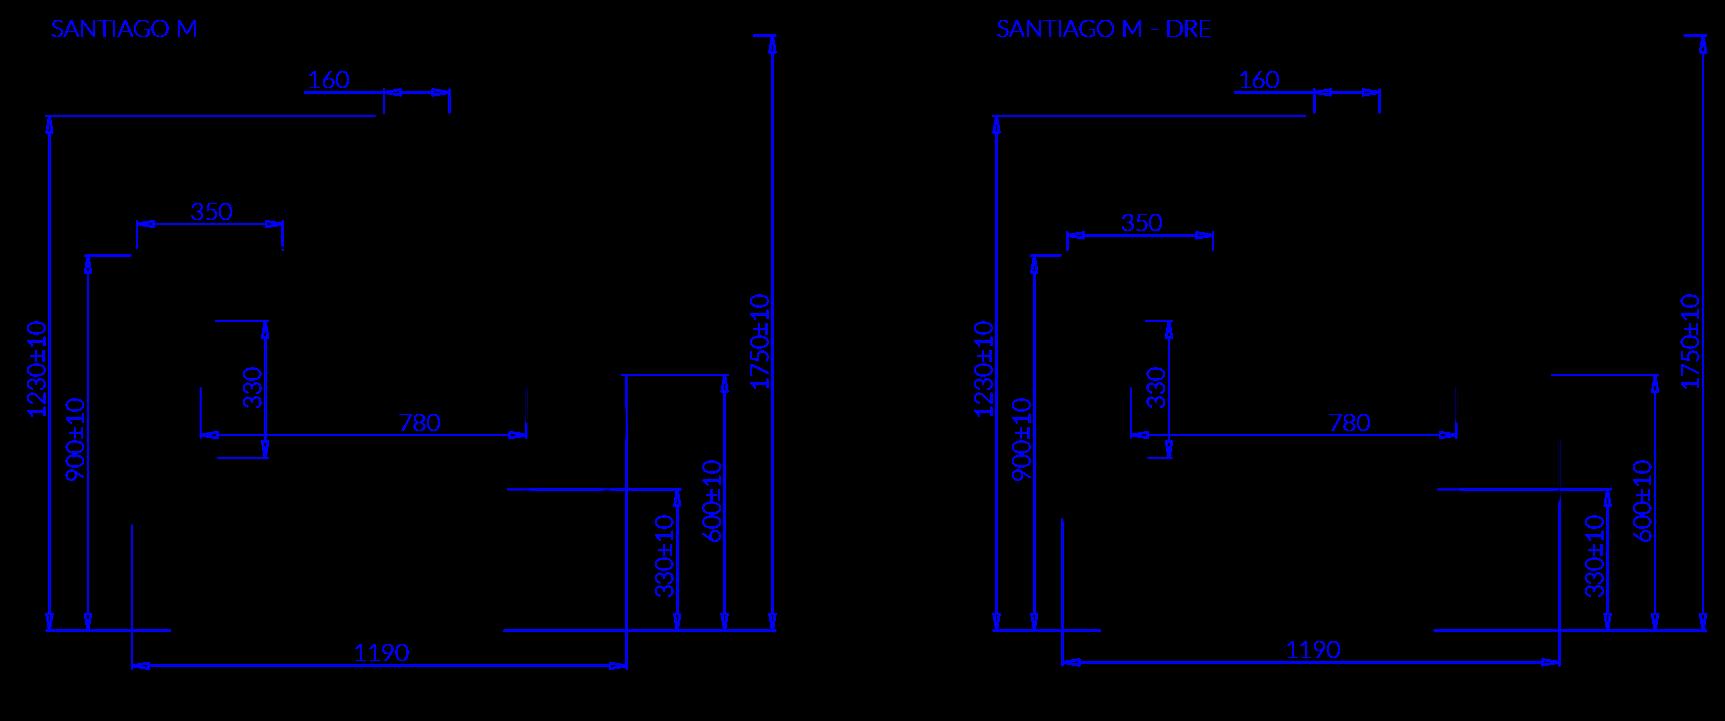 Technical drawing SANTIAGO M MOD C